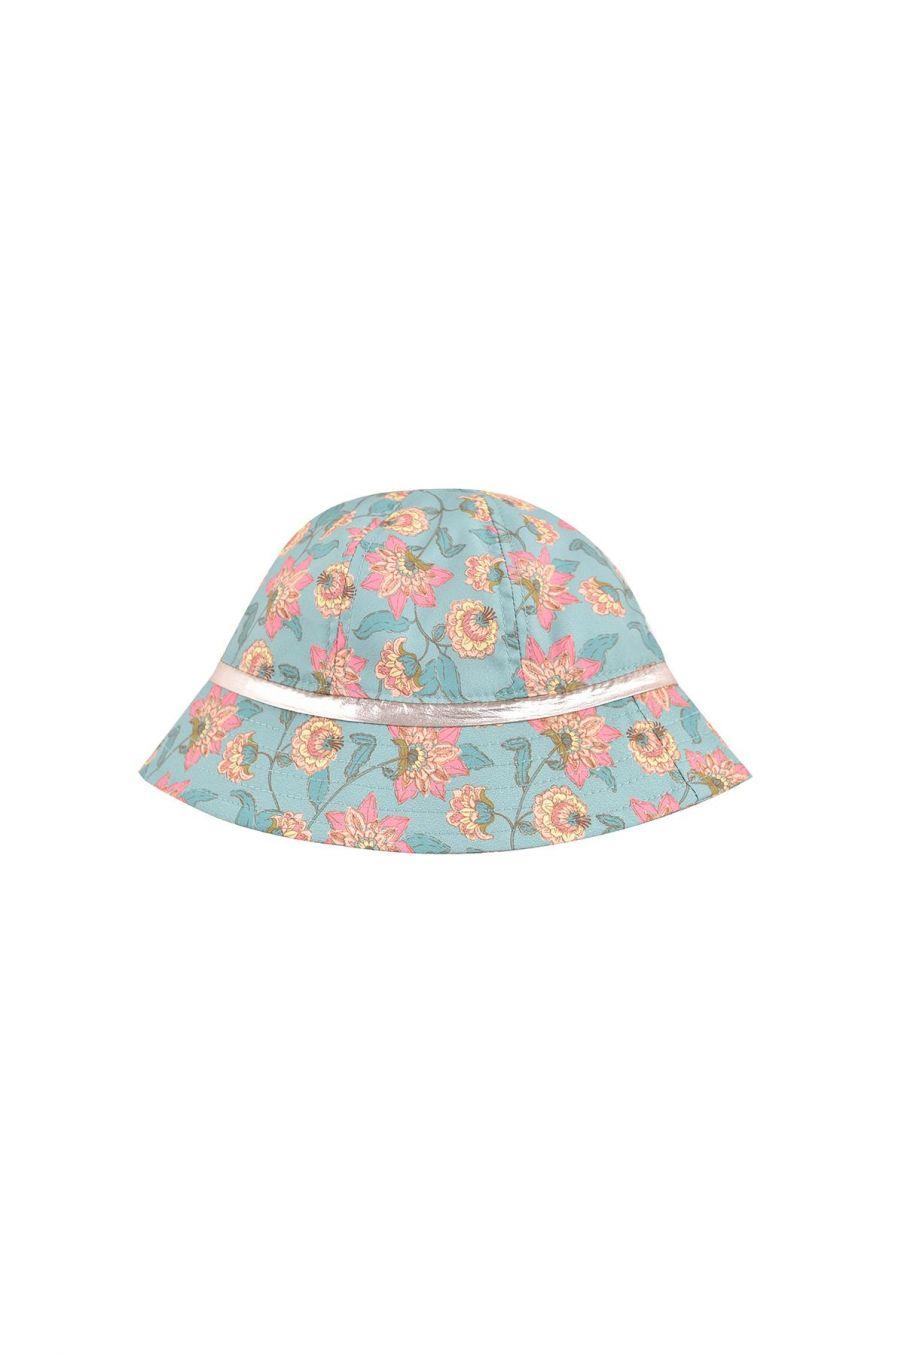 boheme chic vintage chapeau fille granima turquoise flowers